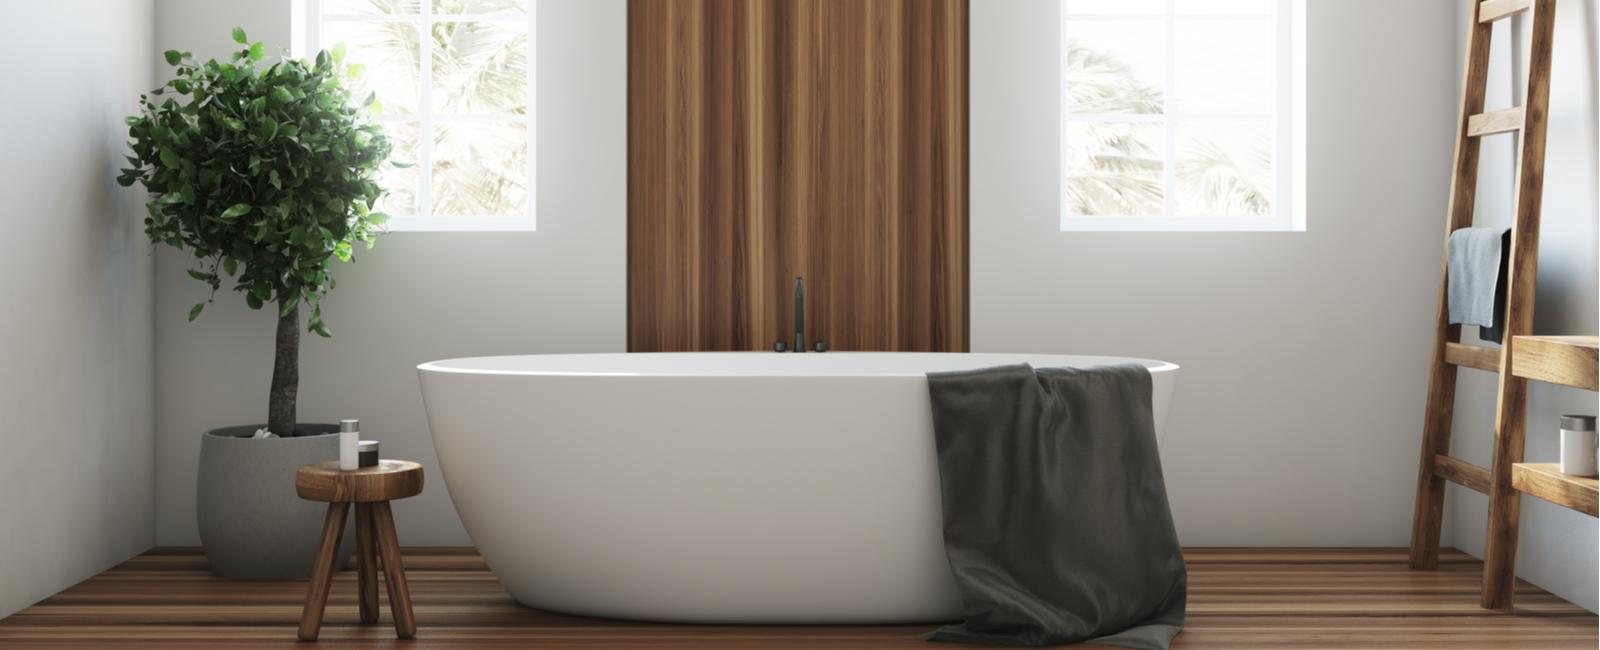 Panneau murale bois salle de bain